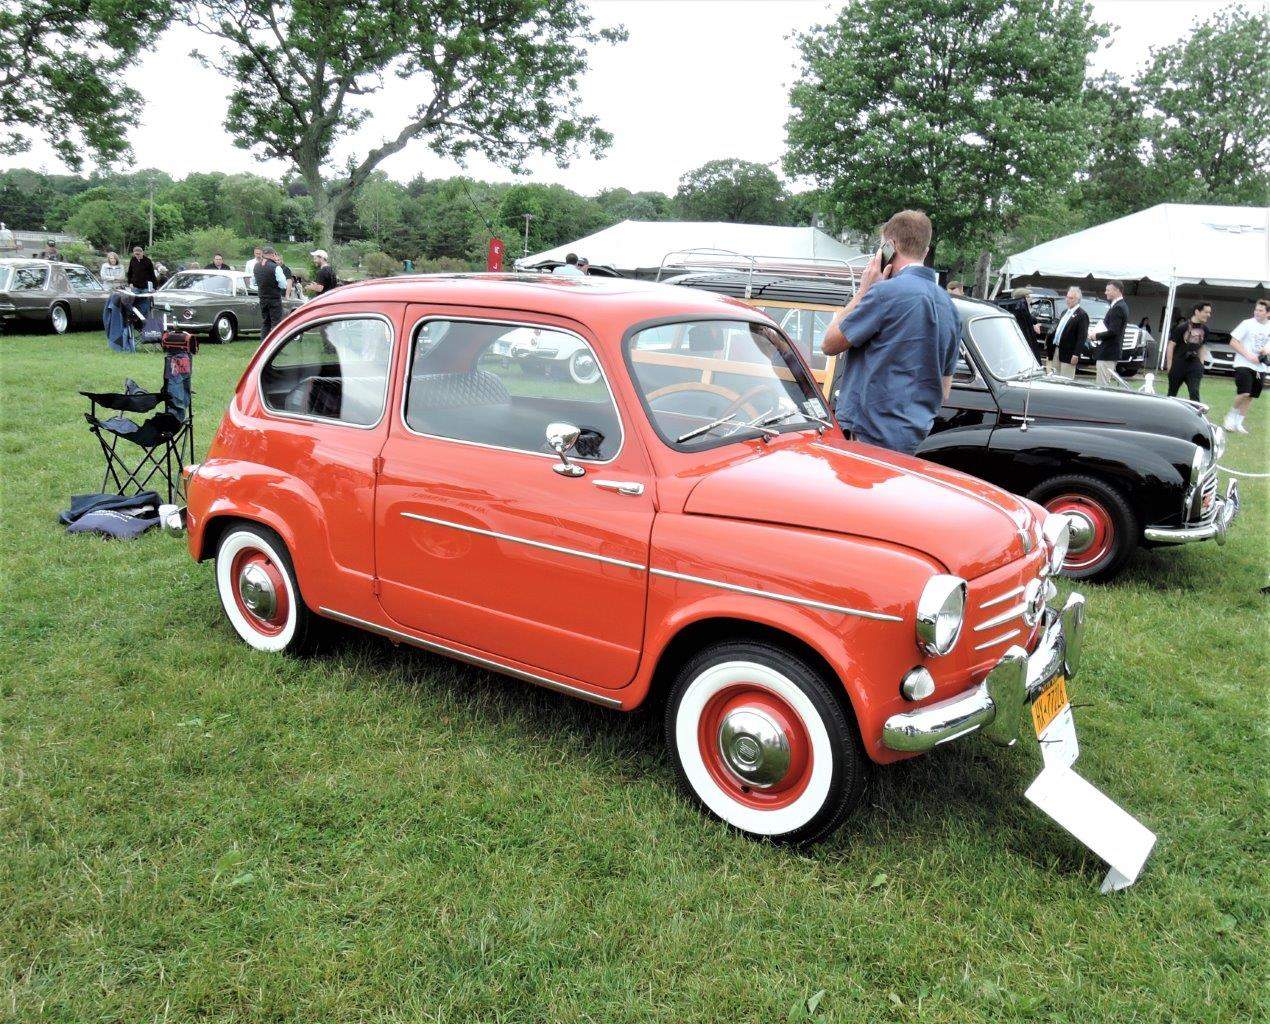 orange 1959 Fiat 600 - 2018 Greenwich Concours International